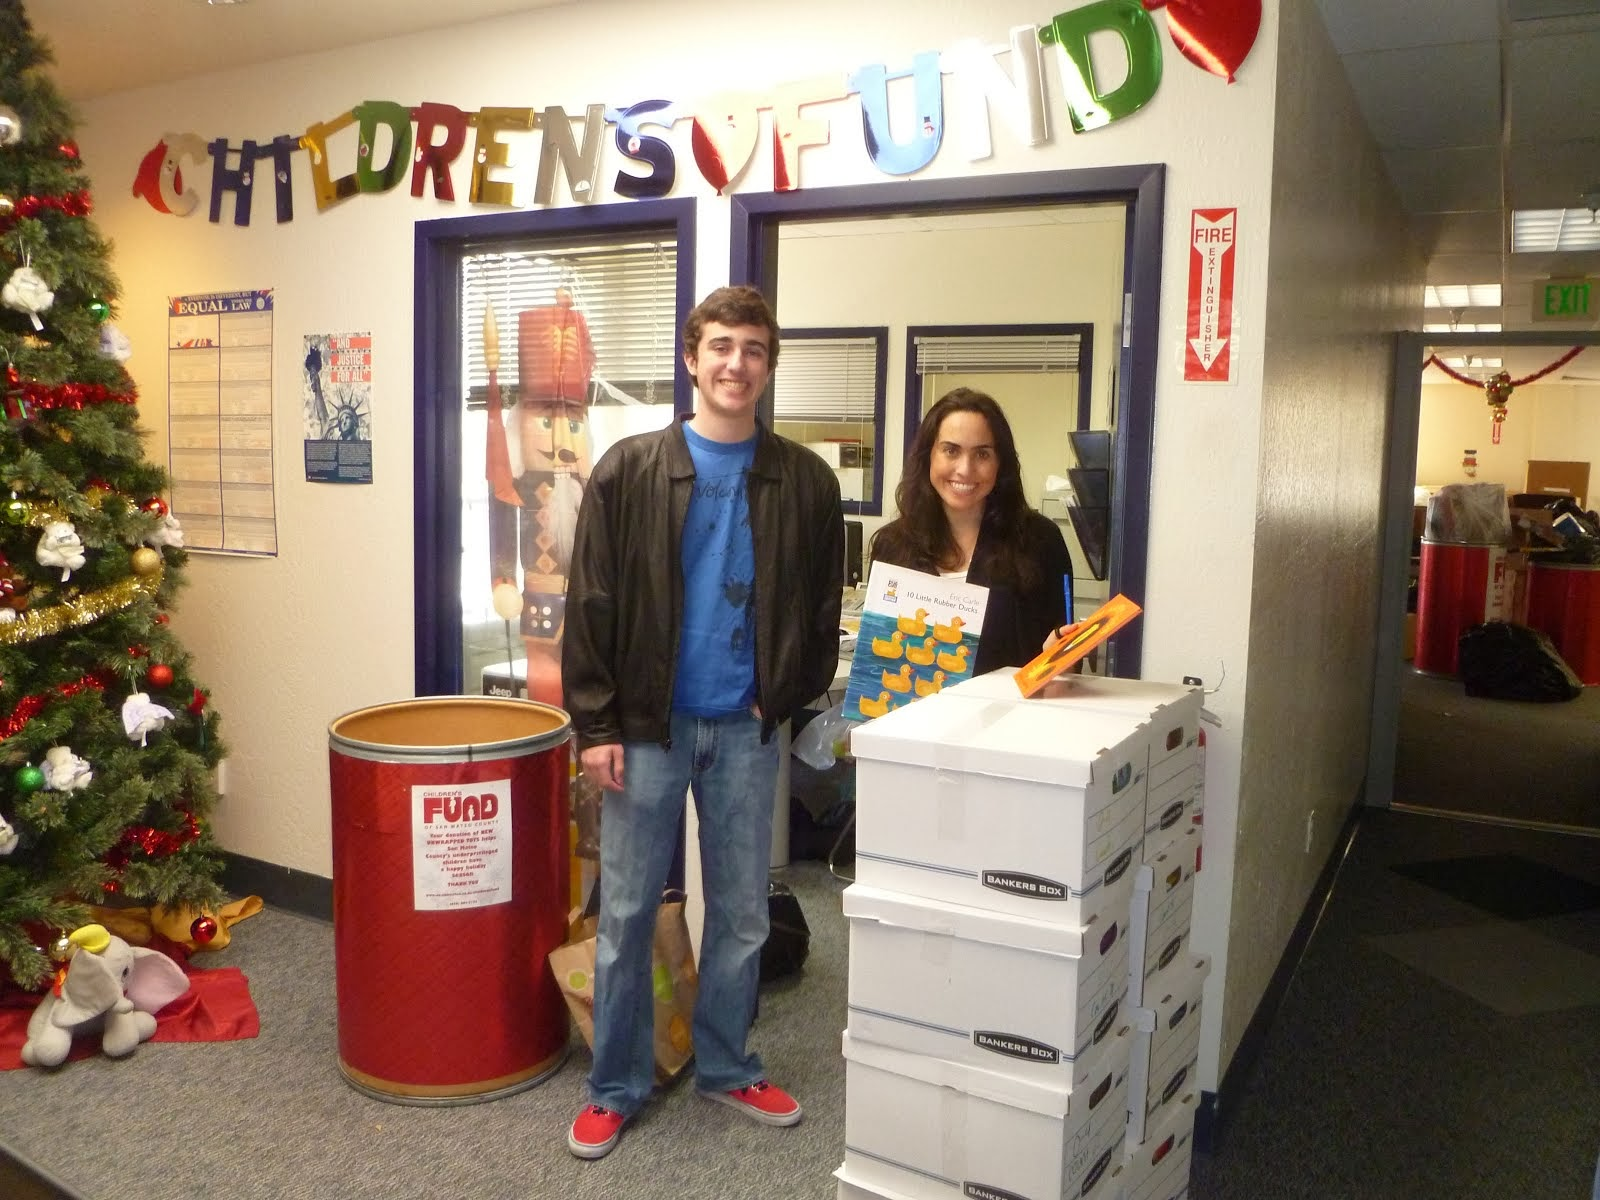 Books Donations to Charities